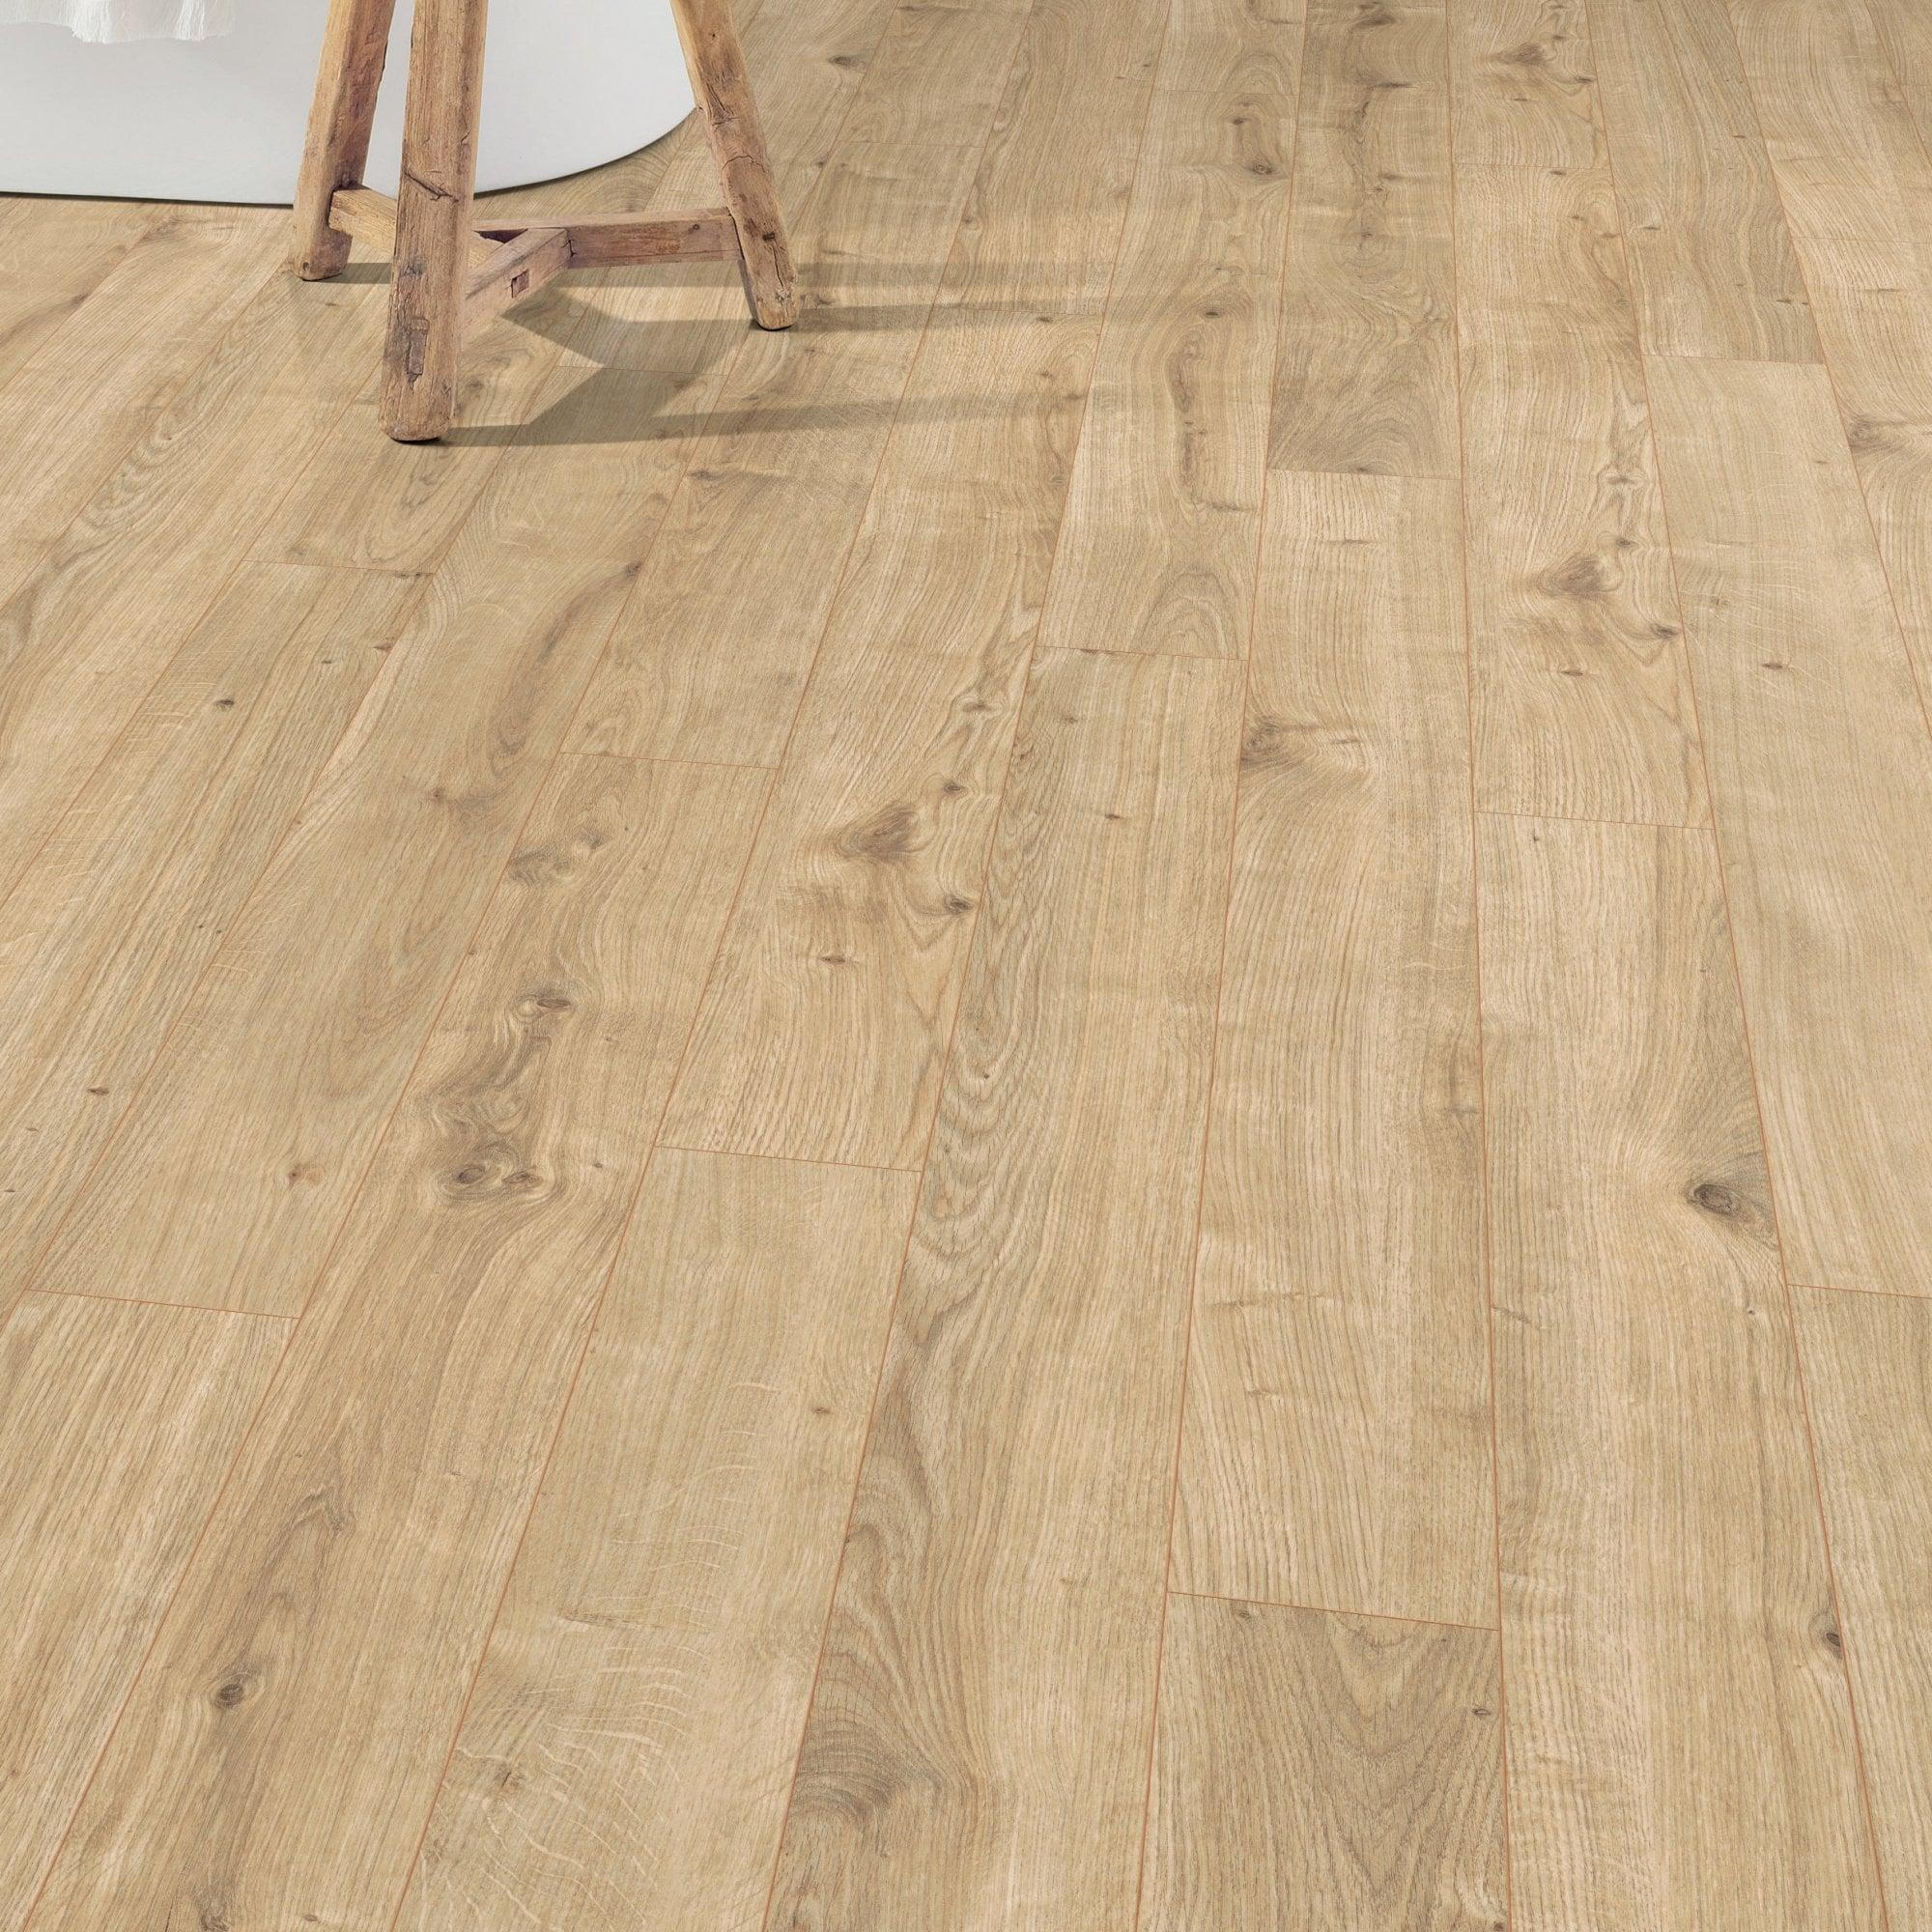 Stone Washed Light Oak Laminate Get, Real Wood Effect Laminate Flooring